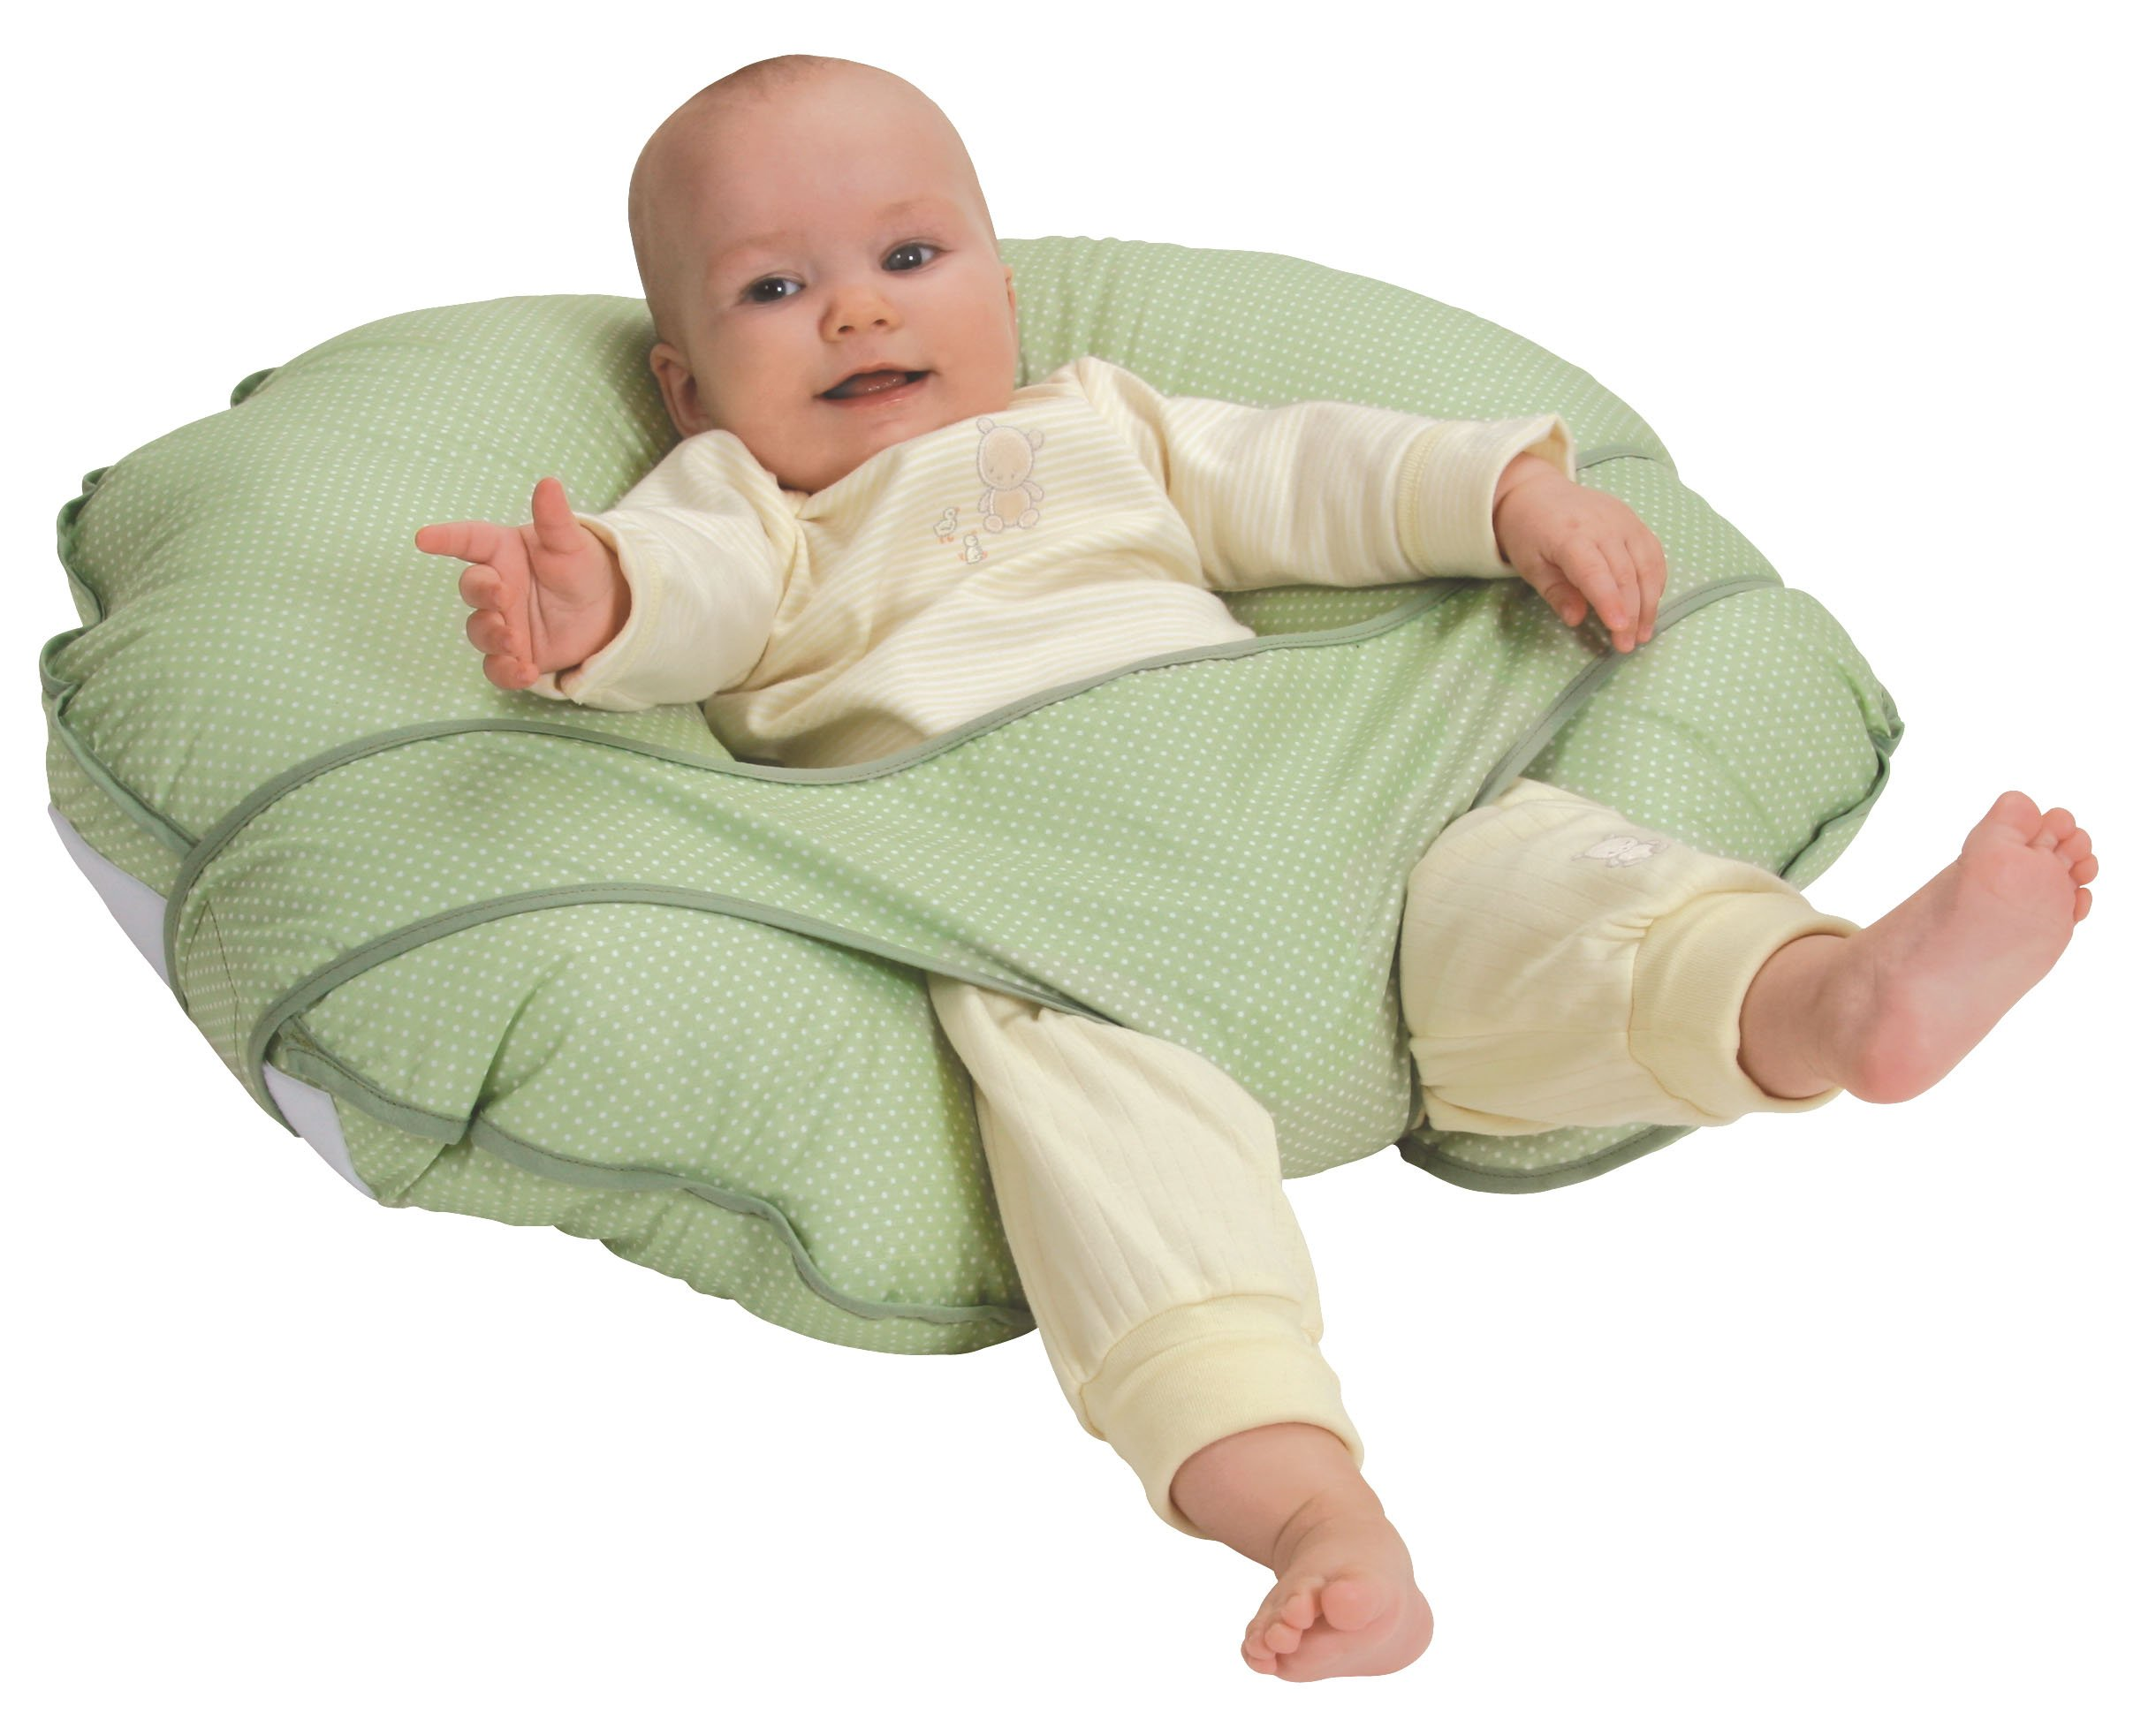 Leachco Cuddle-U Basic Nursing Pillow and More, Sage Pin Dot by Leachco